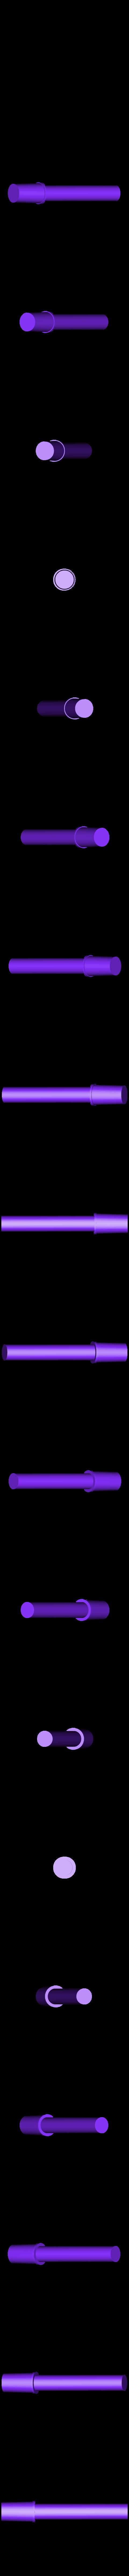 Piston_Rod-_Rear.STL Download free STL file 4-8-8-4 Big Boy Locomotive • 3D printer object, RaymondDeLuca